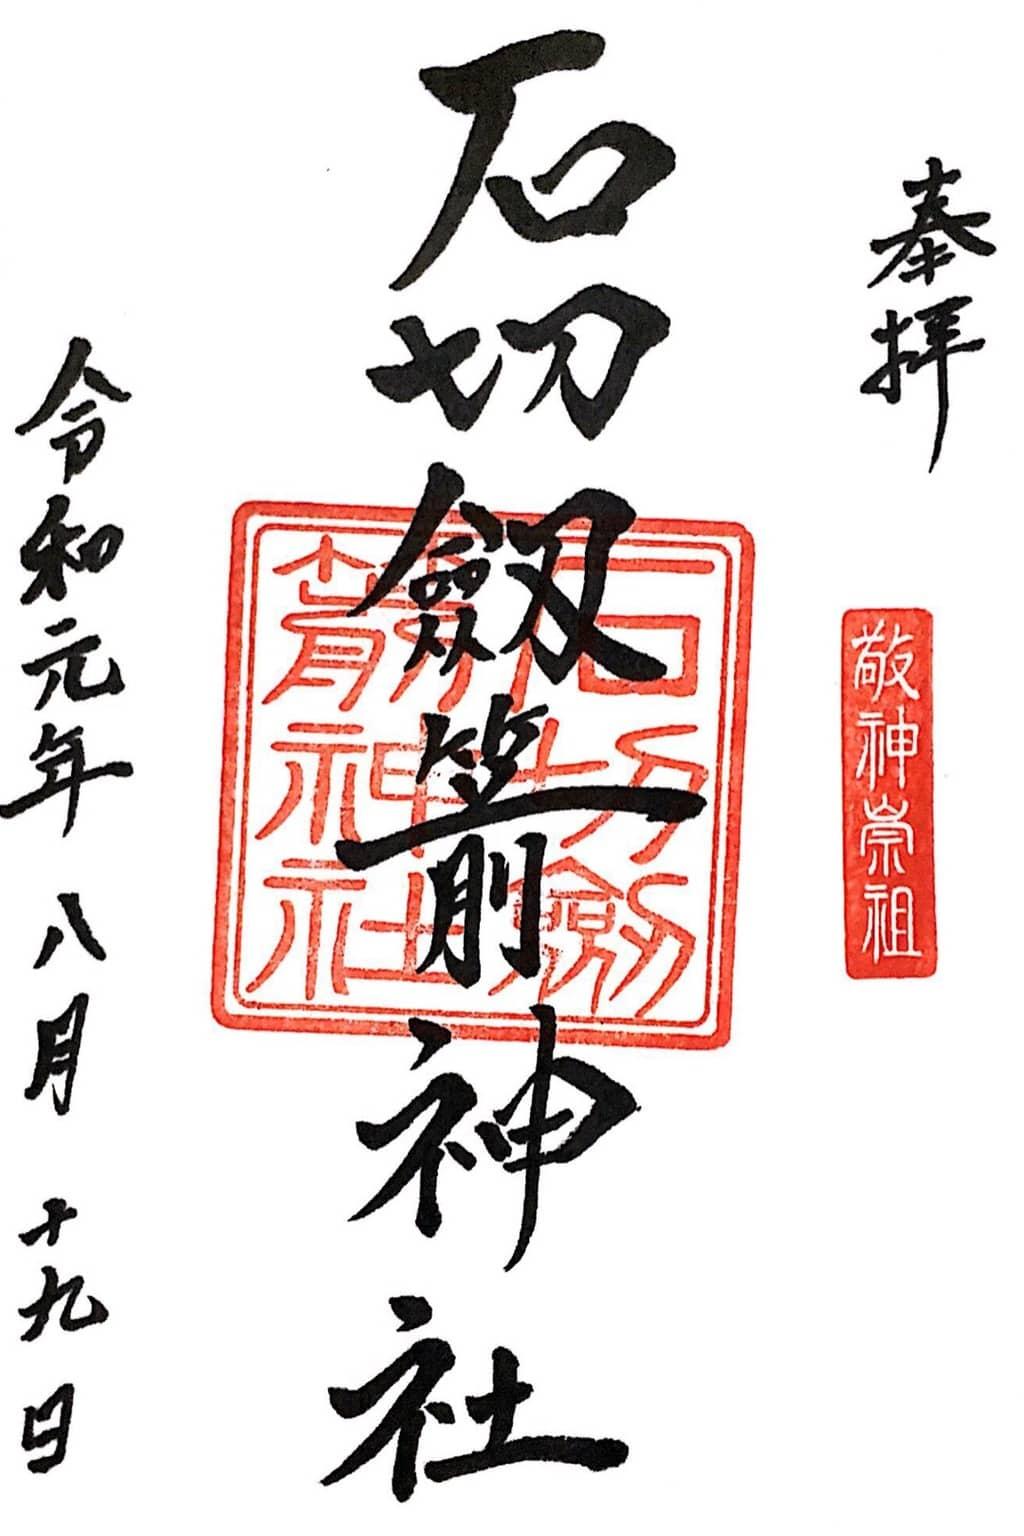 石切劔箭神社の御朱印